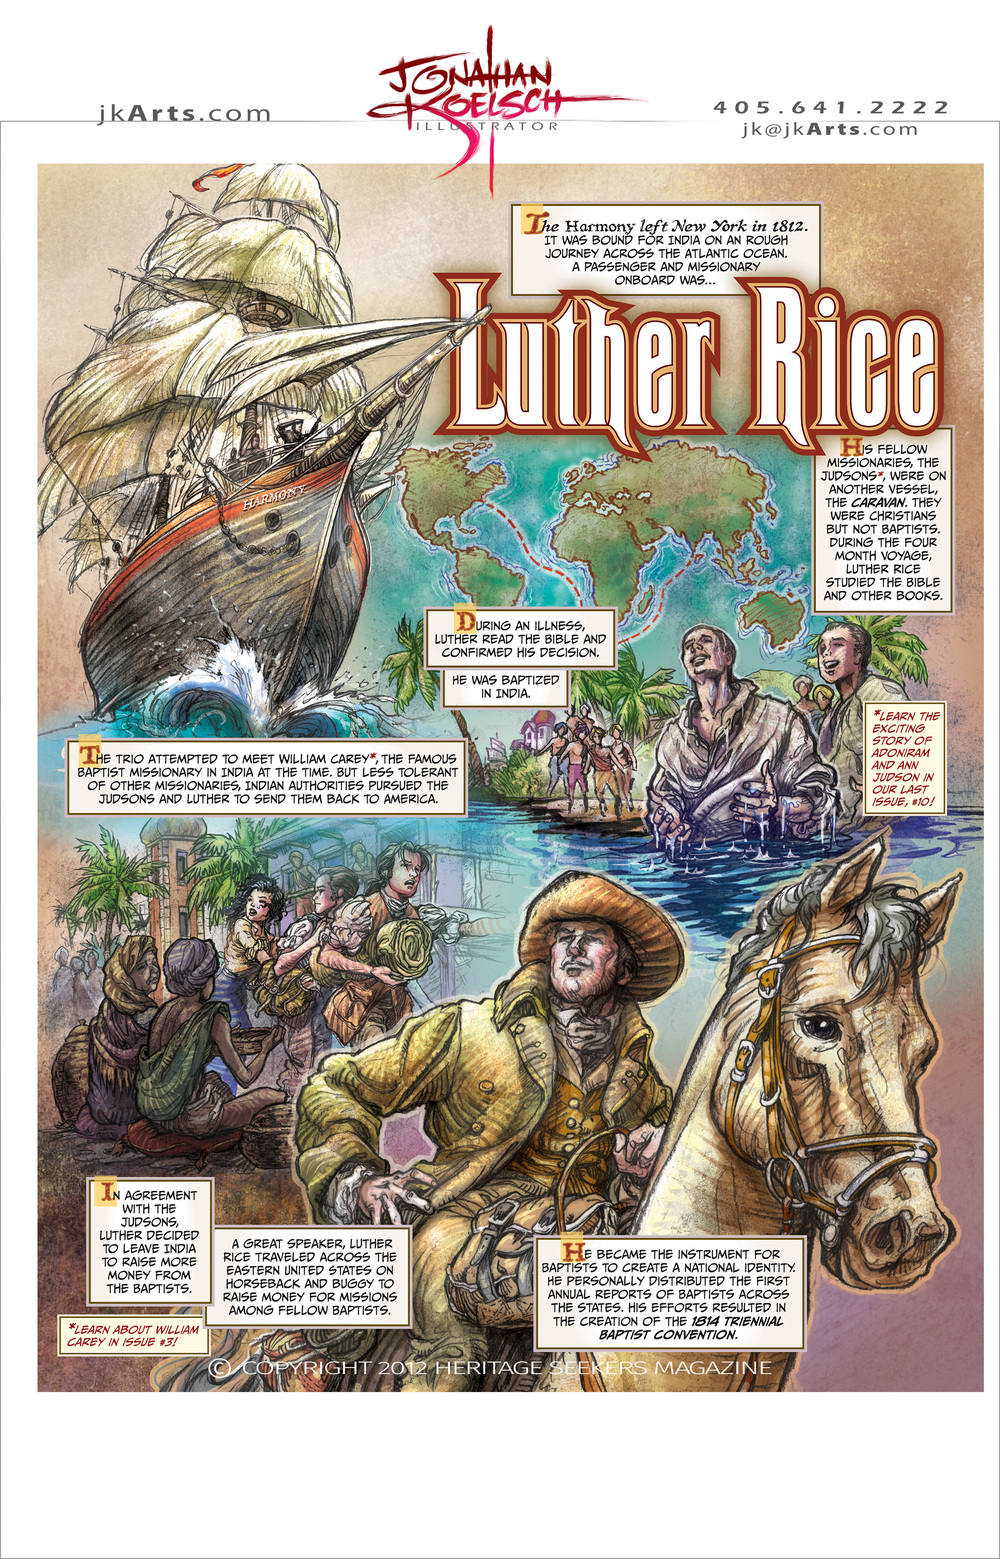 Heritage LutherRice1.jpg